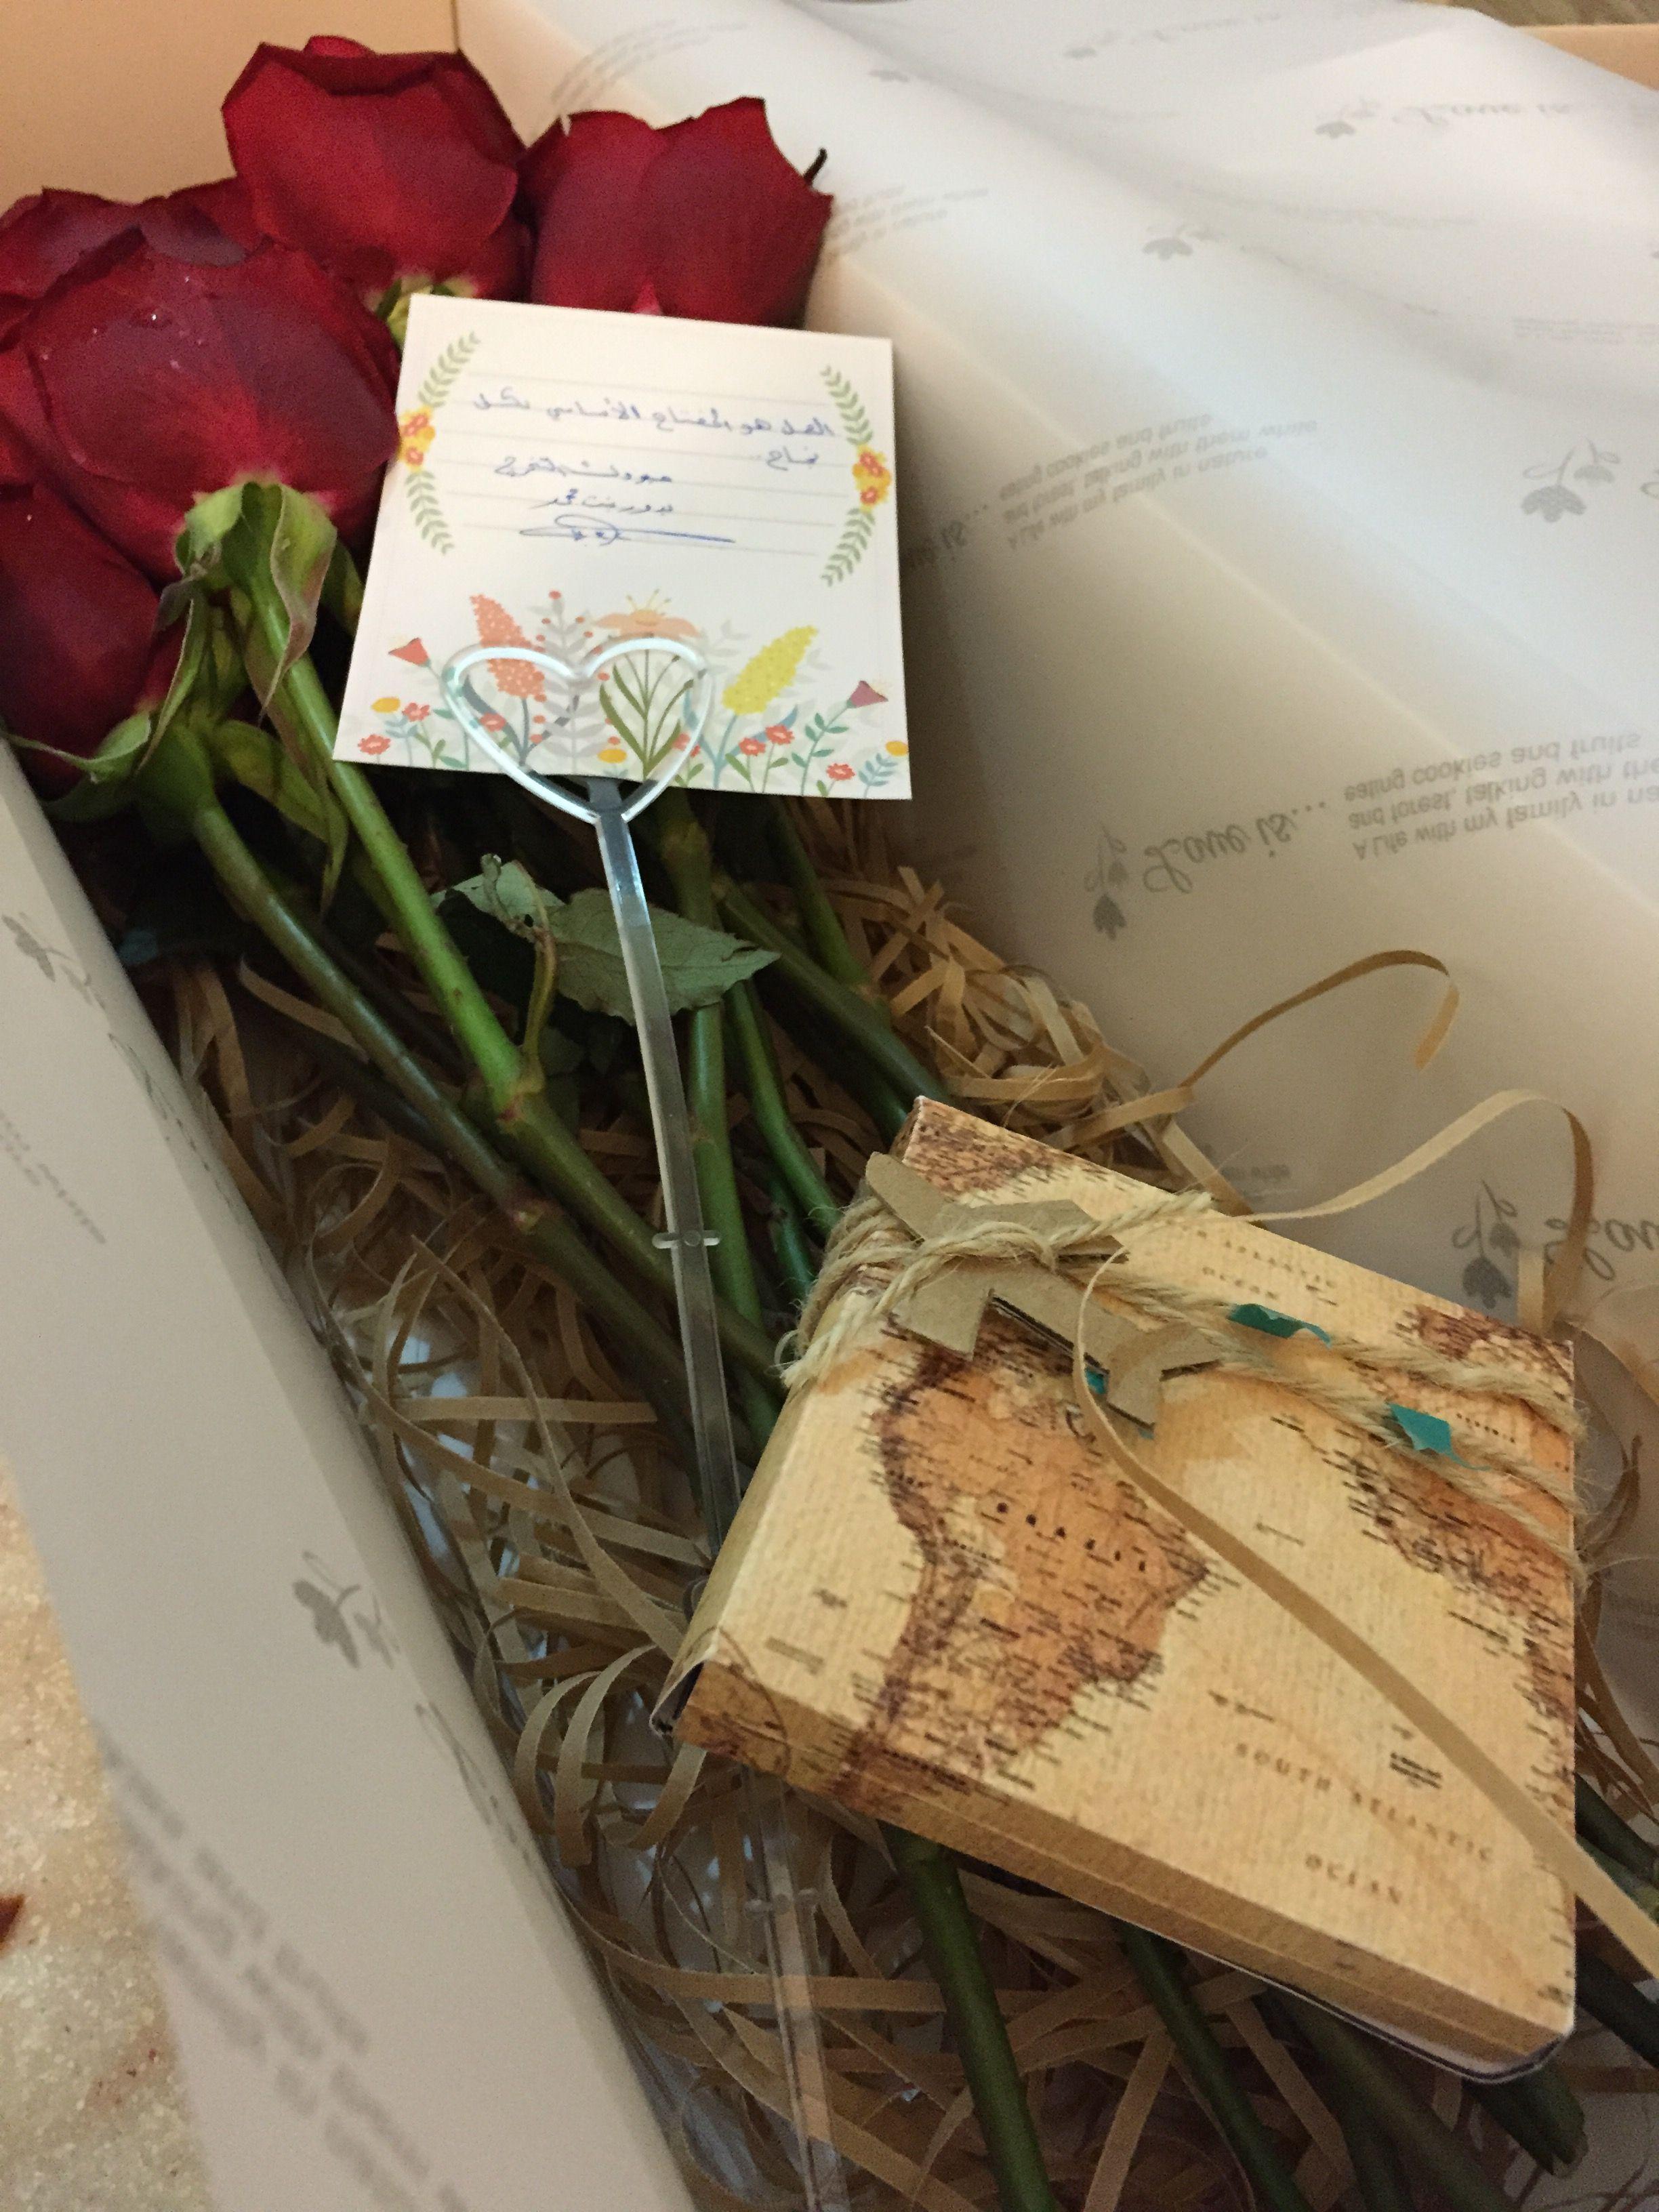 تغليف هديه هدايا زواج افكار ورد باقه جميله Table Decorations Gifts Gift Box